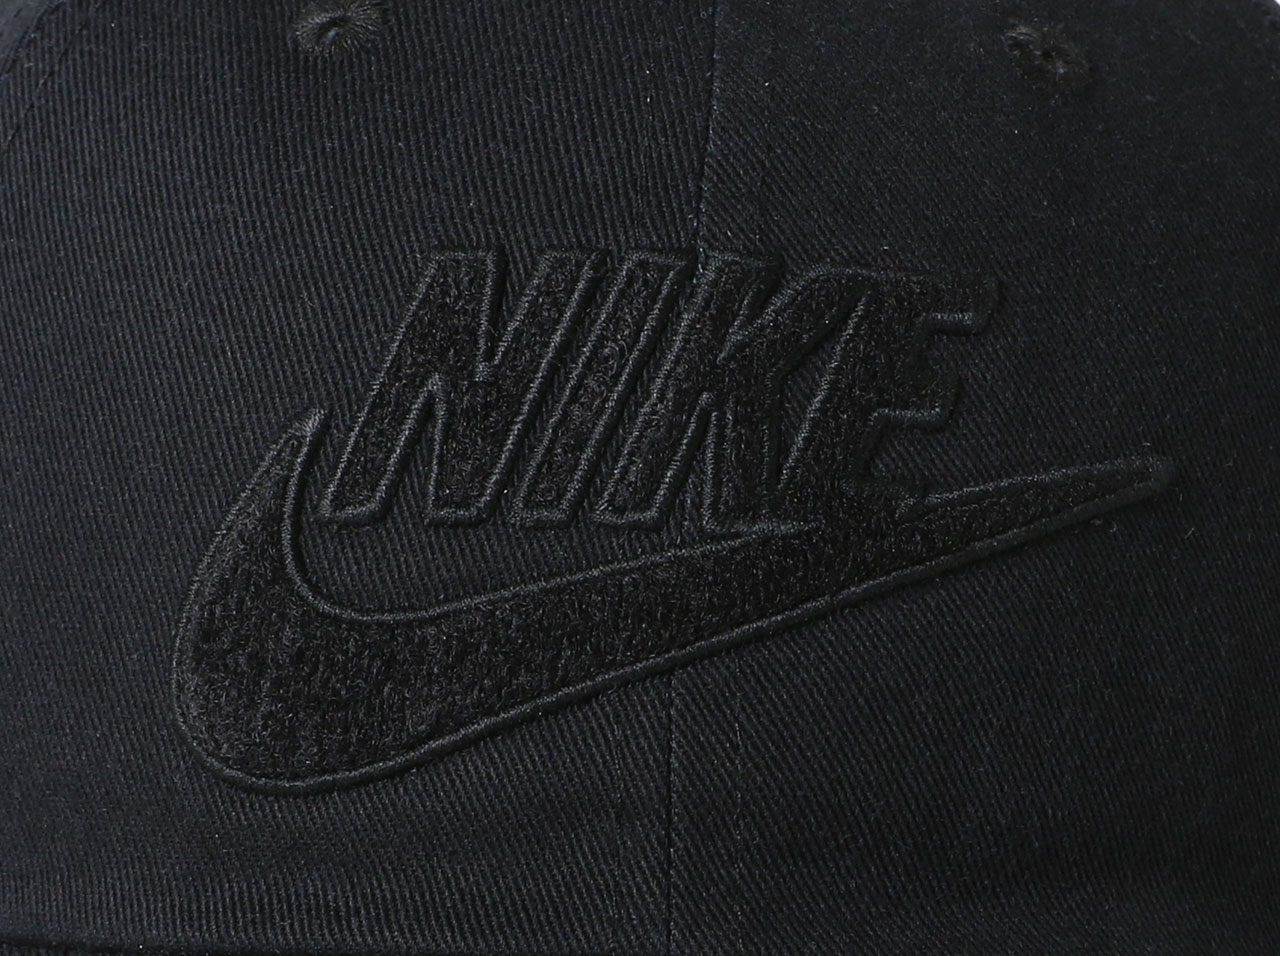 【SALE】NIKE WOMENS H86 JDIY CAP - BLACK